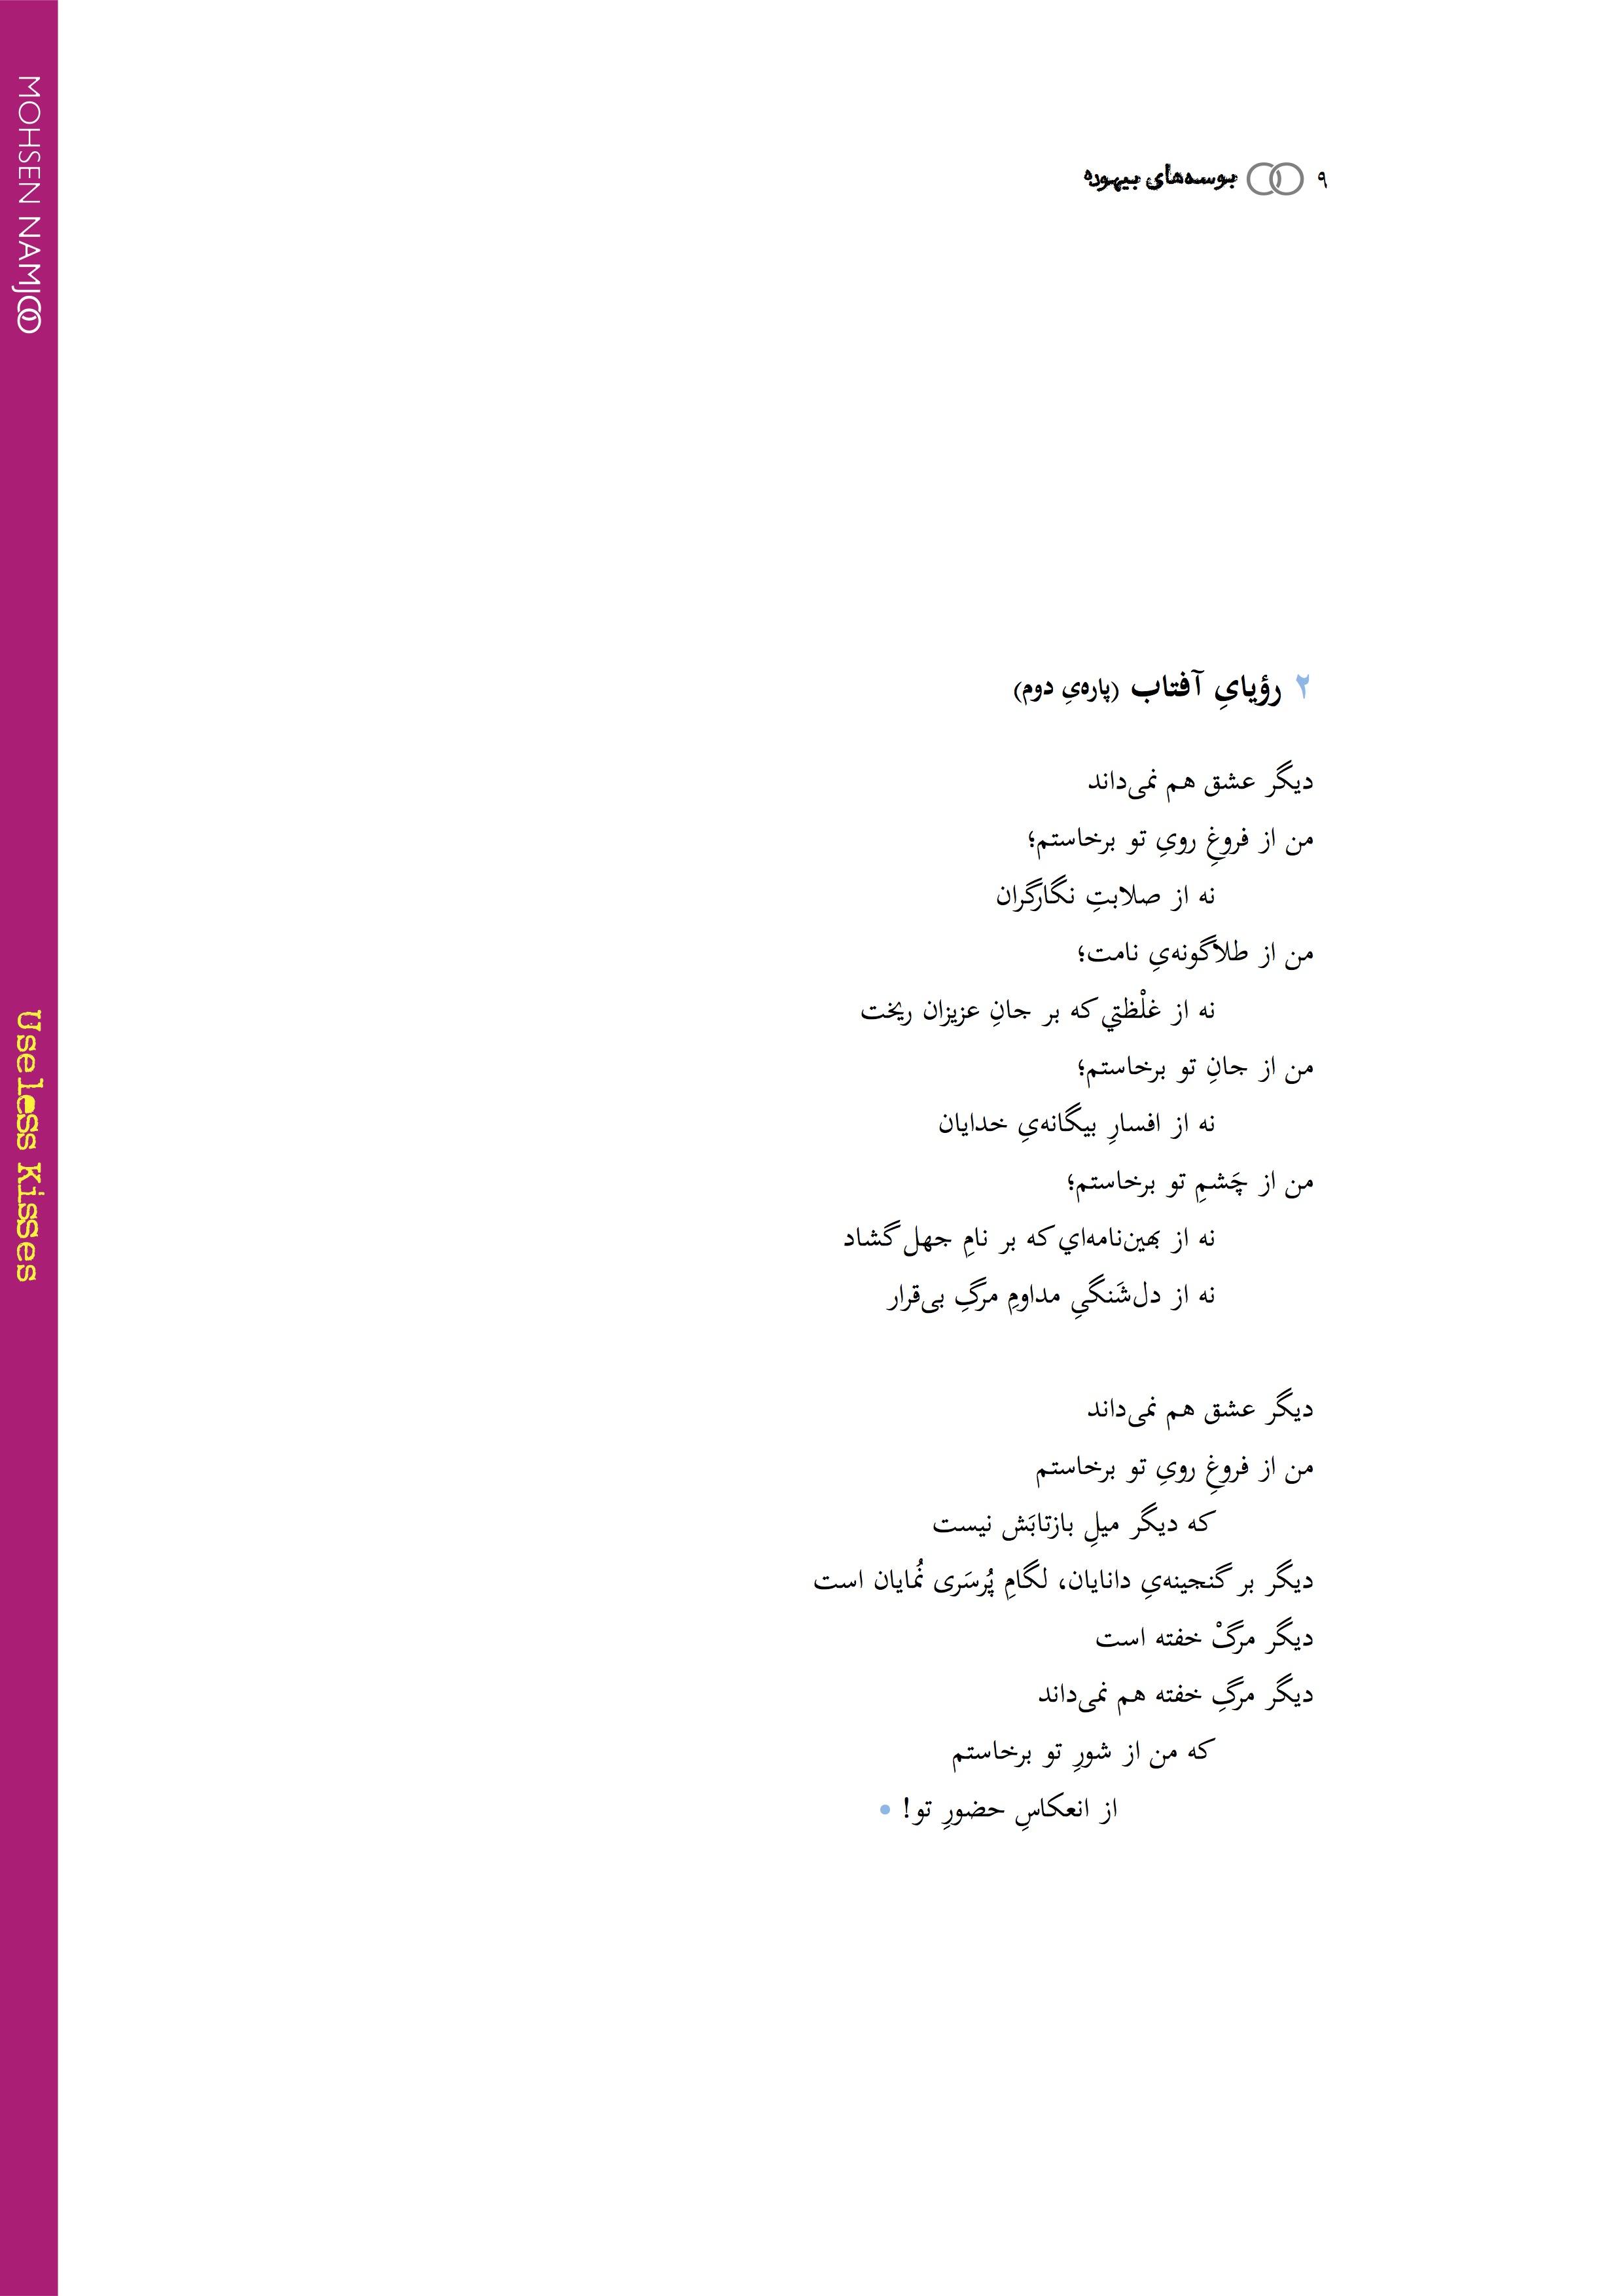 8Useless Kisses eBook (2nd Edition).jpg